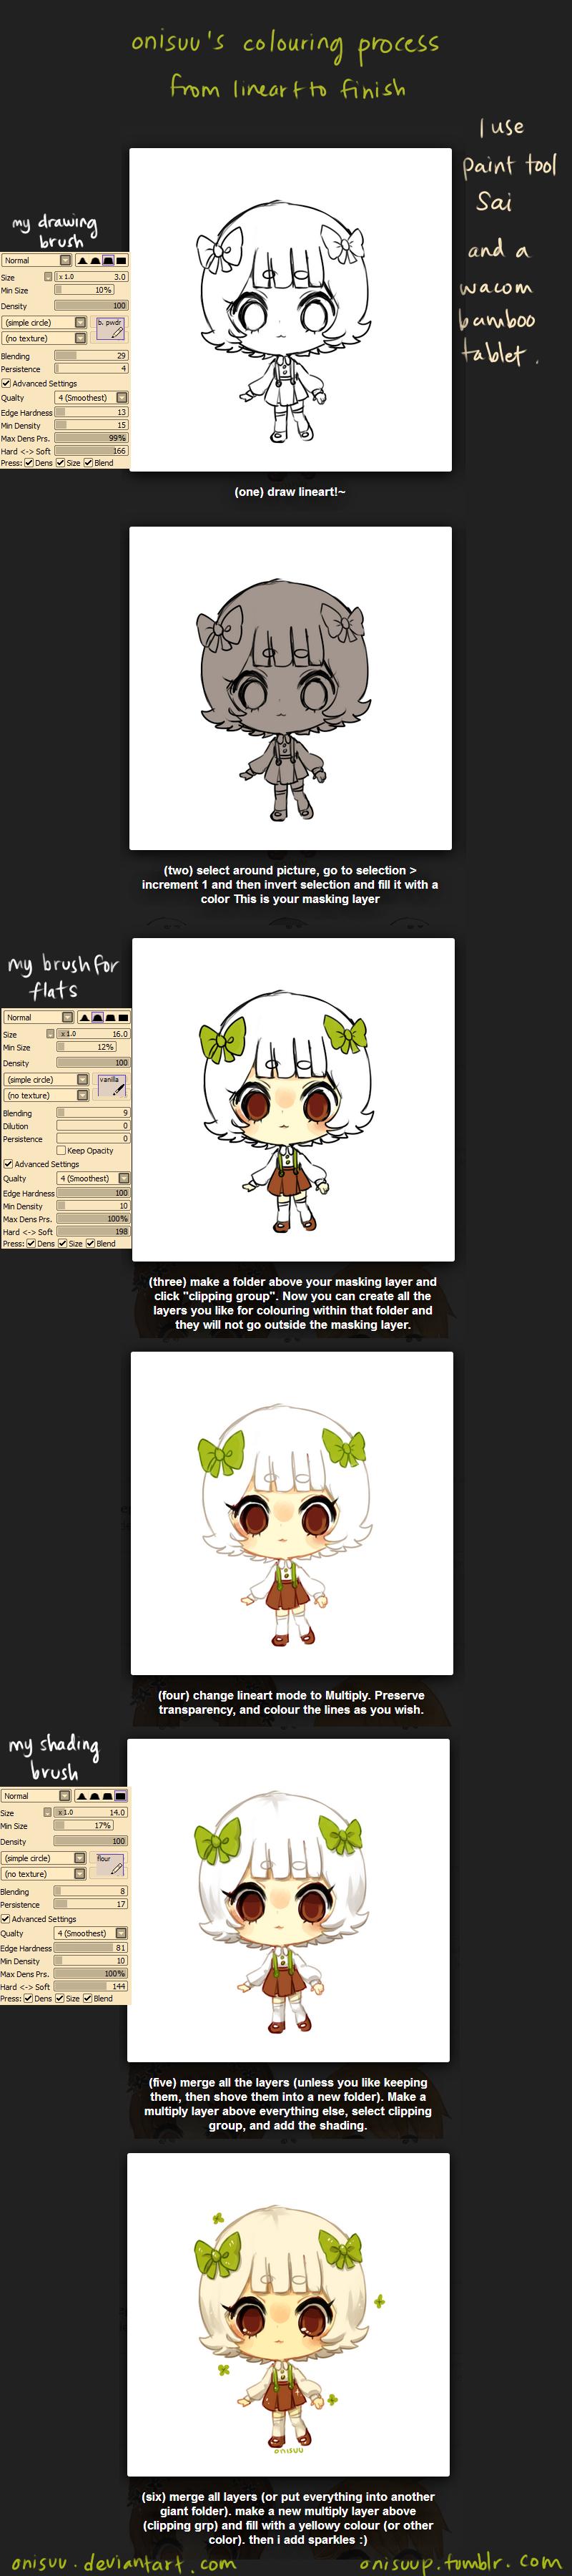 SAI -- My colouring process by onisuu